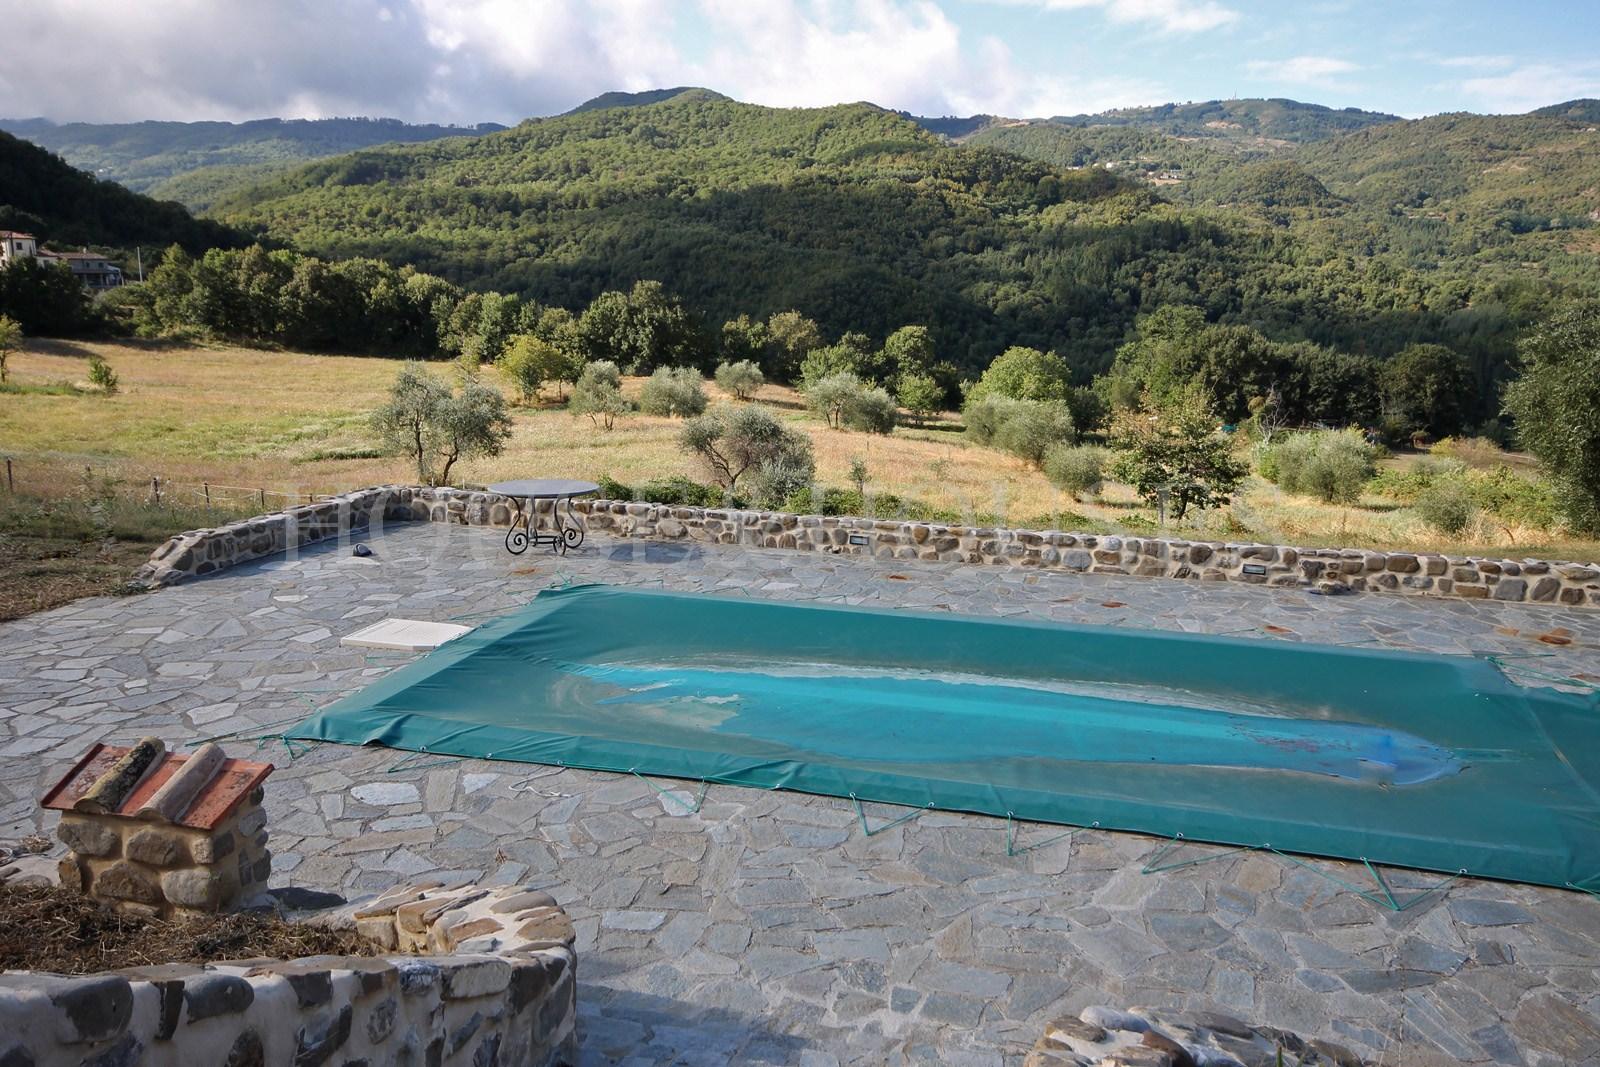 Toscana grosseto arcidosso villa con piscina in vendita house and houses italia - Piscine in toscana ...